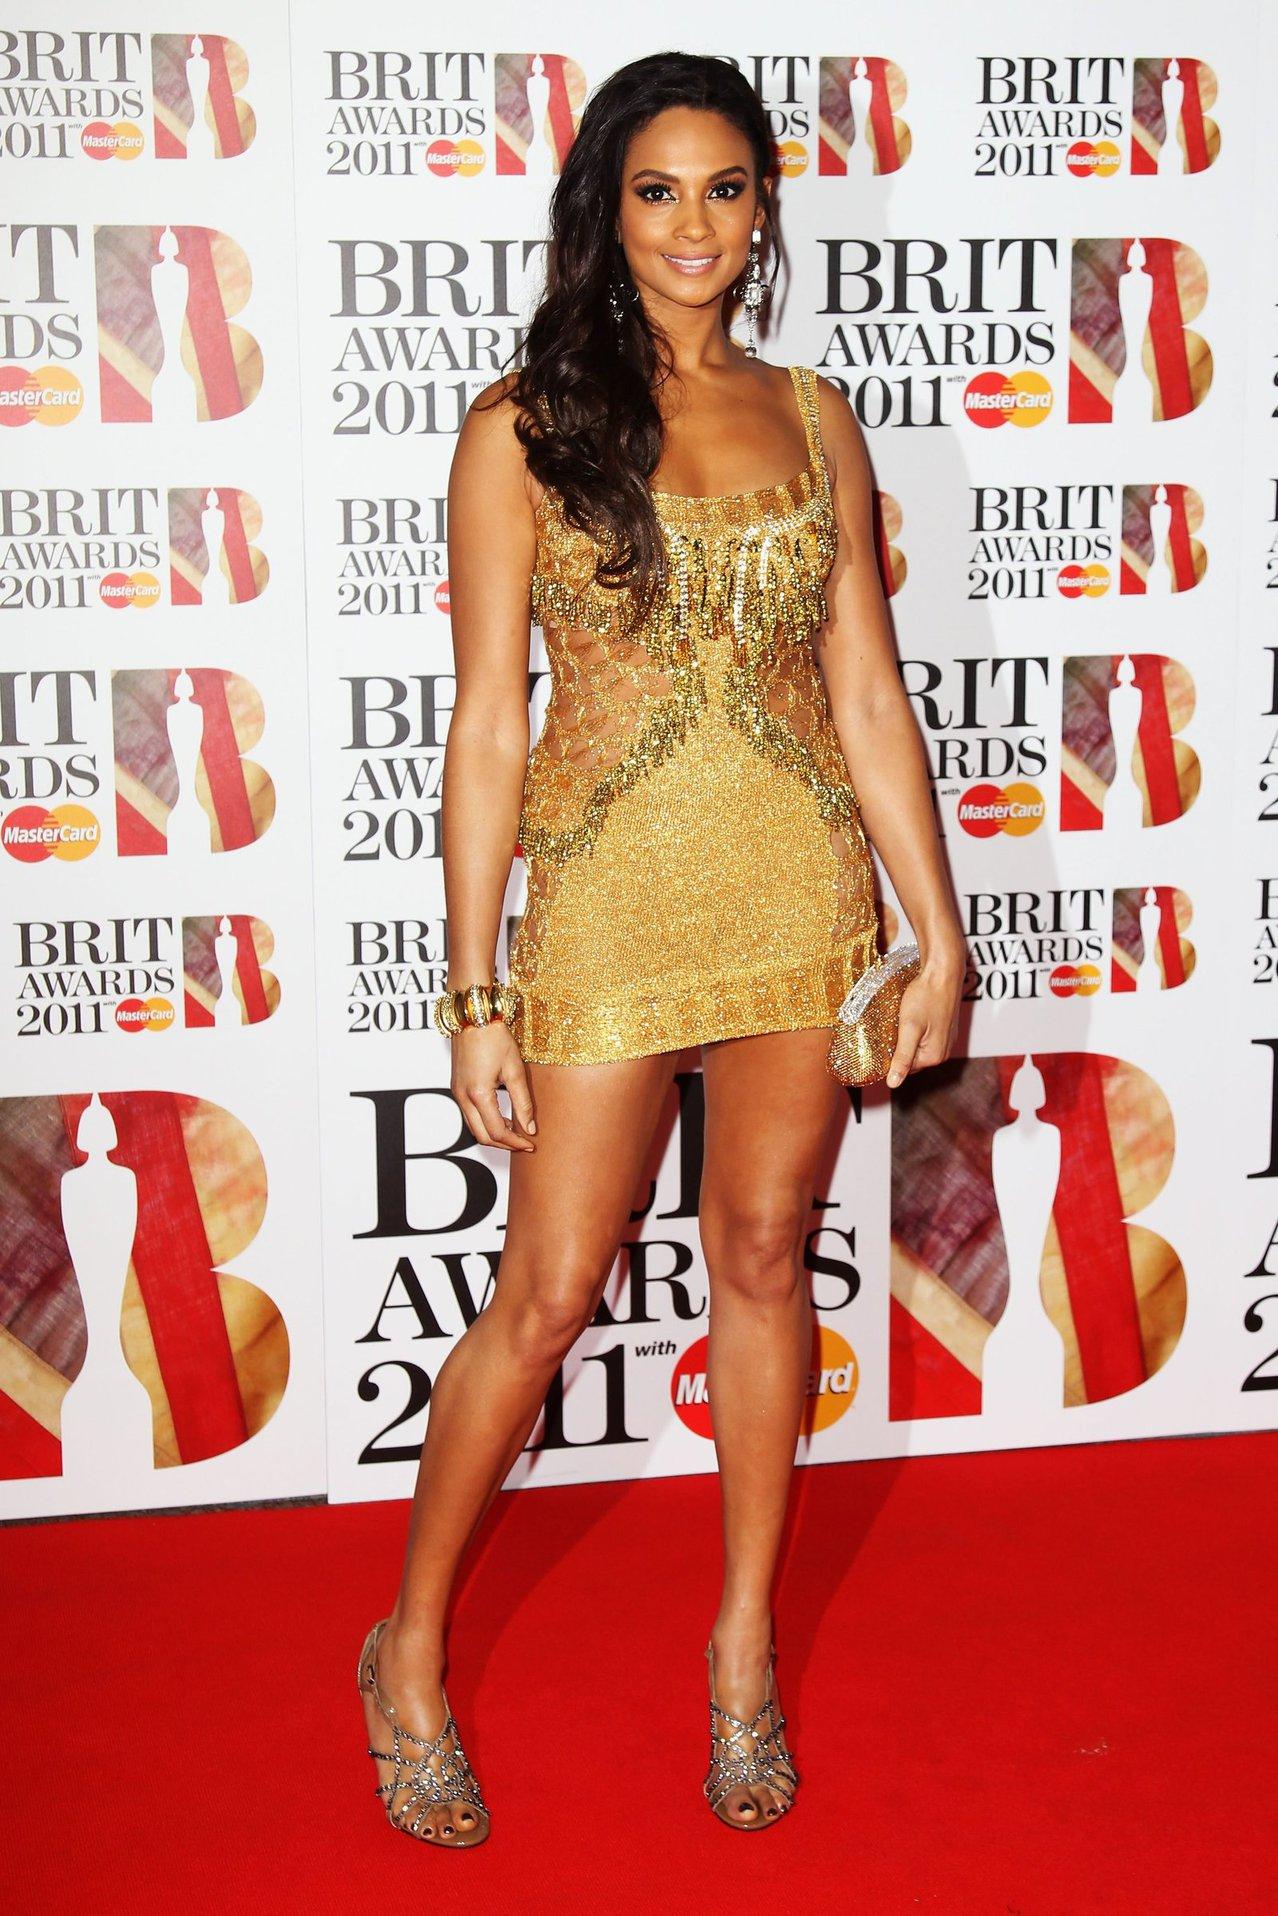 Alesha Dixon - Brit Awards - London - Feb 15, 2011